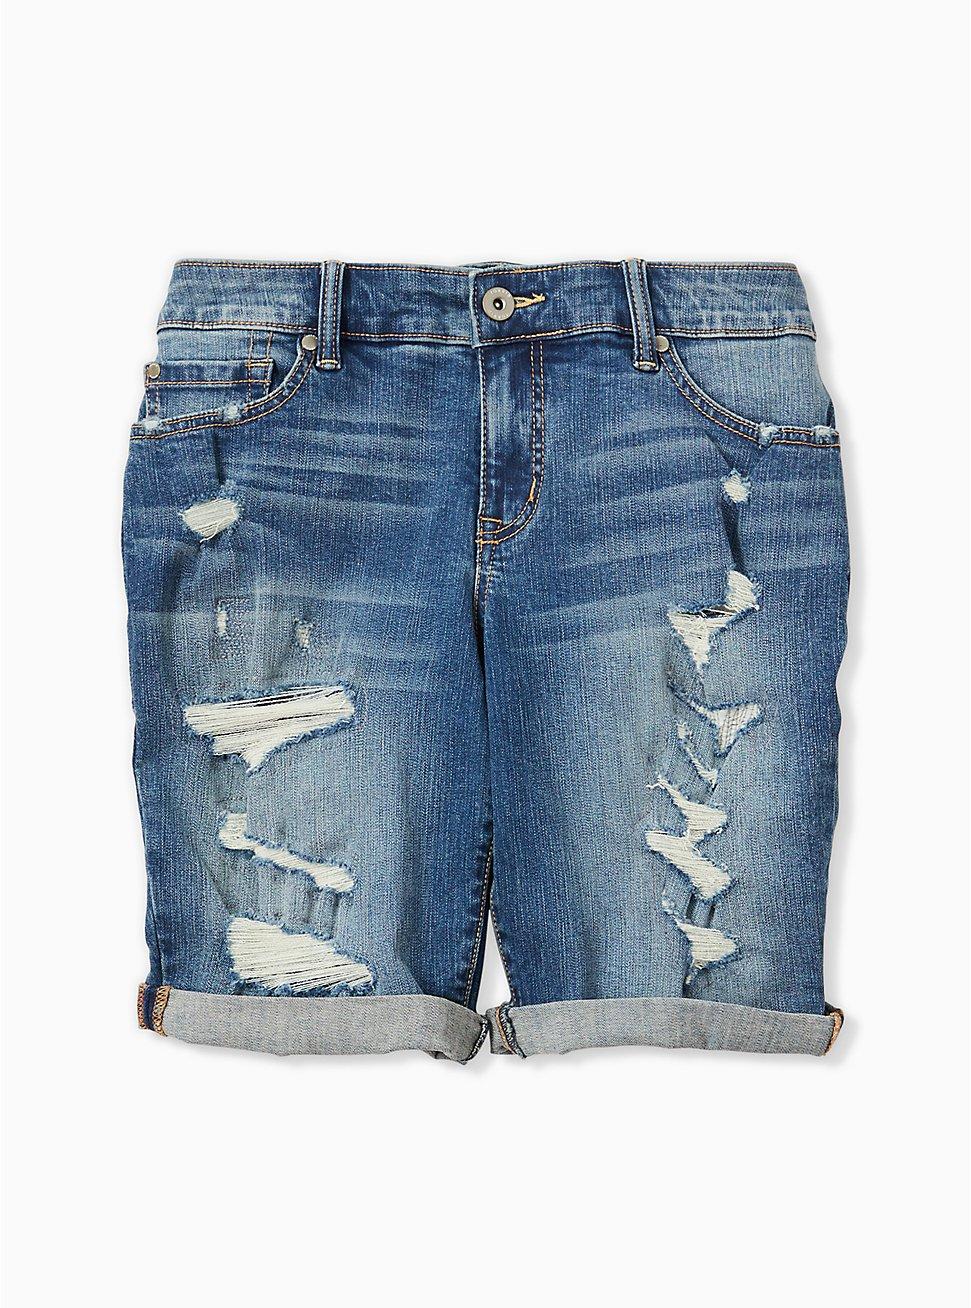 Low Rise Bermuda Short - Vintage Stretch Medium Wash, HANG TEN, hi-res